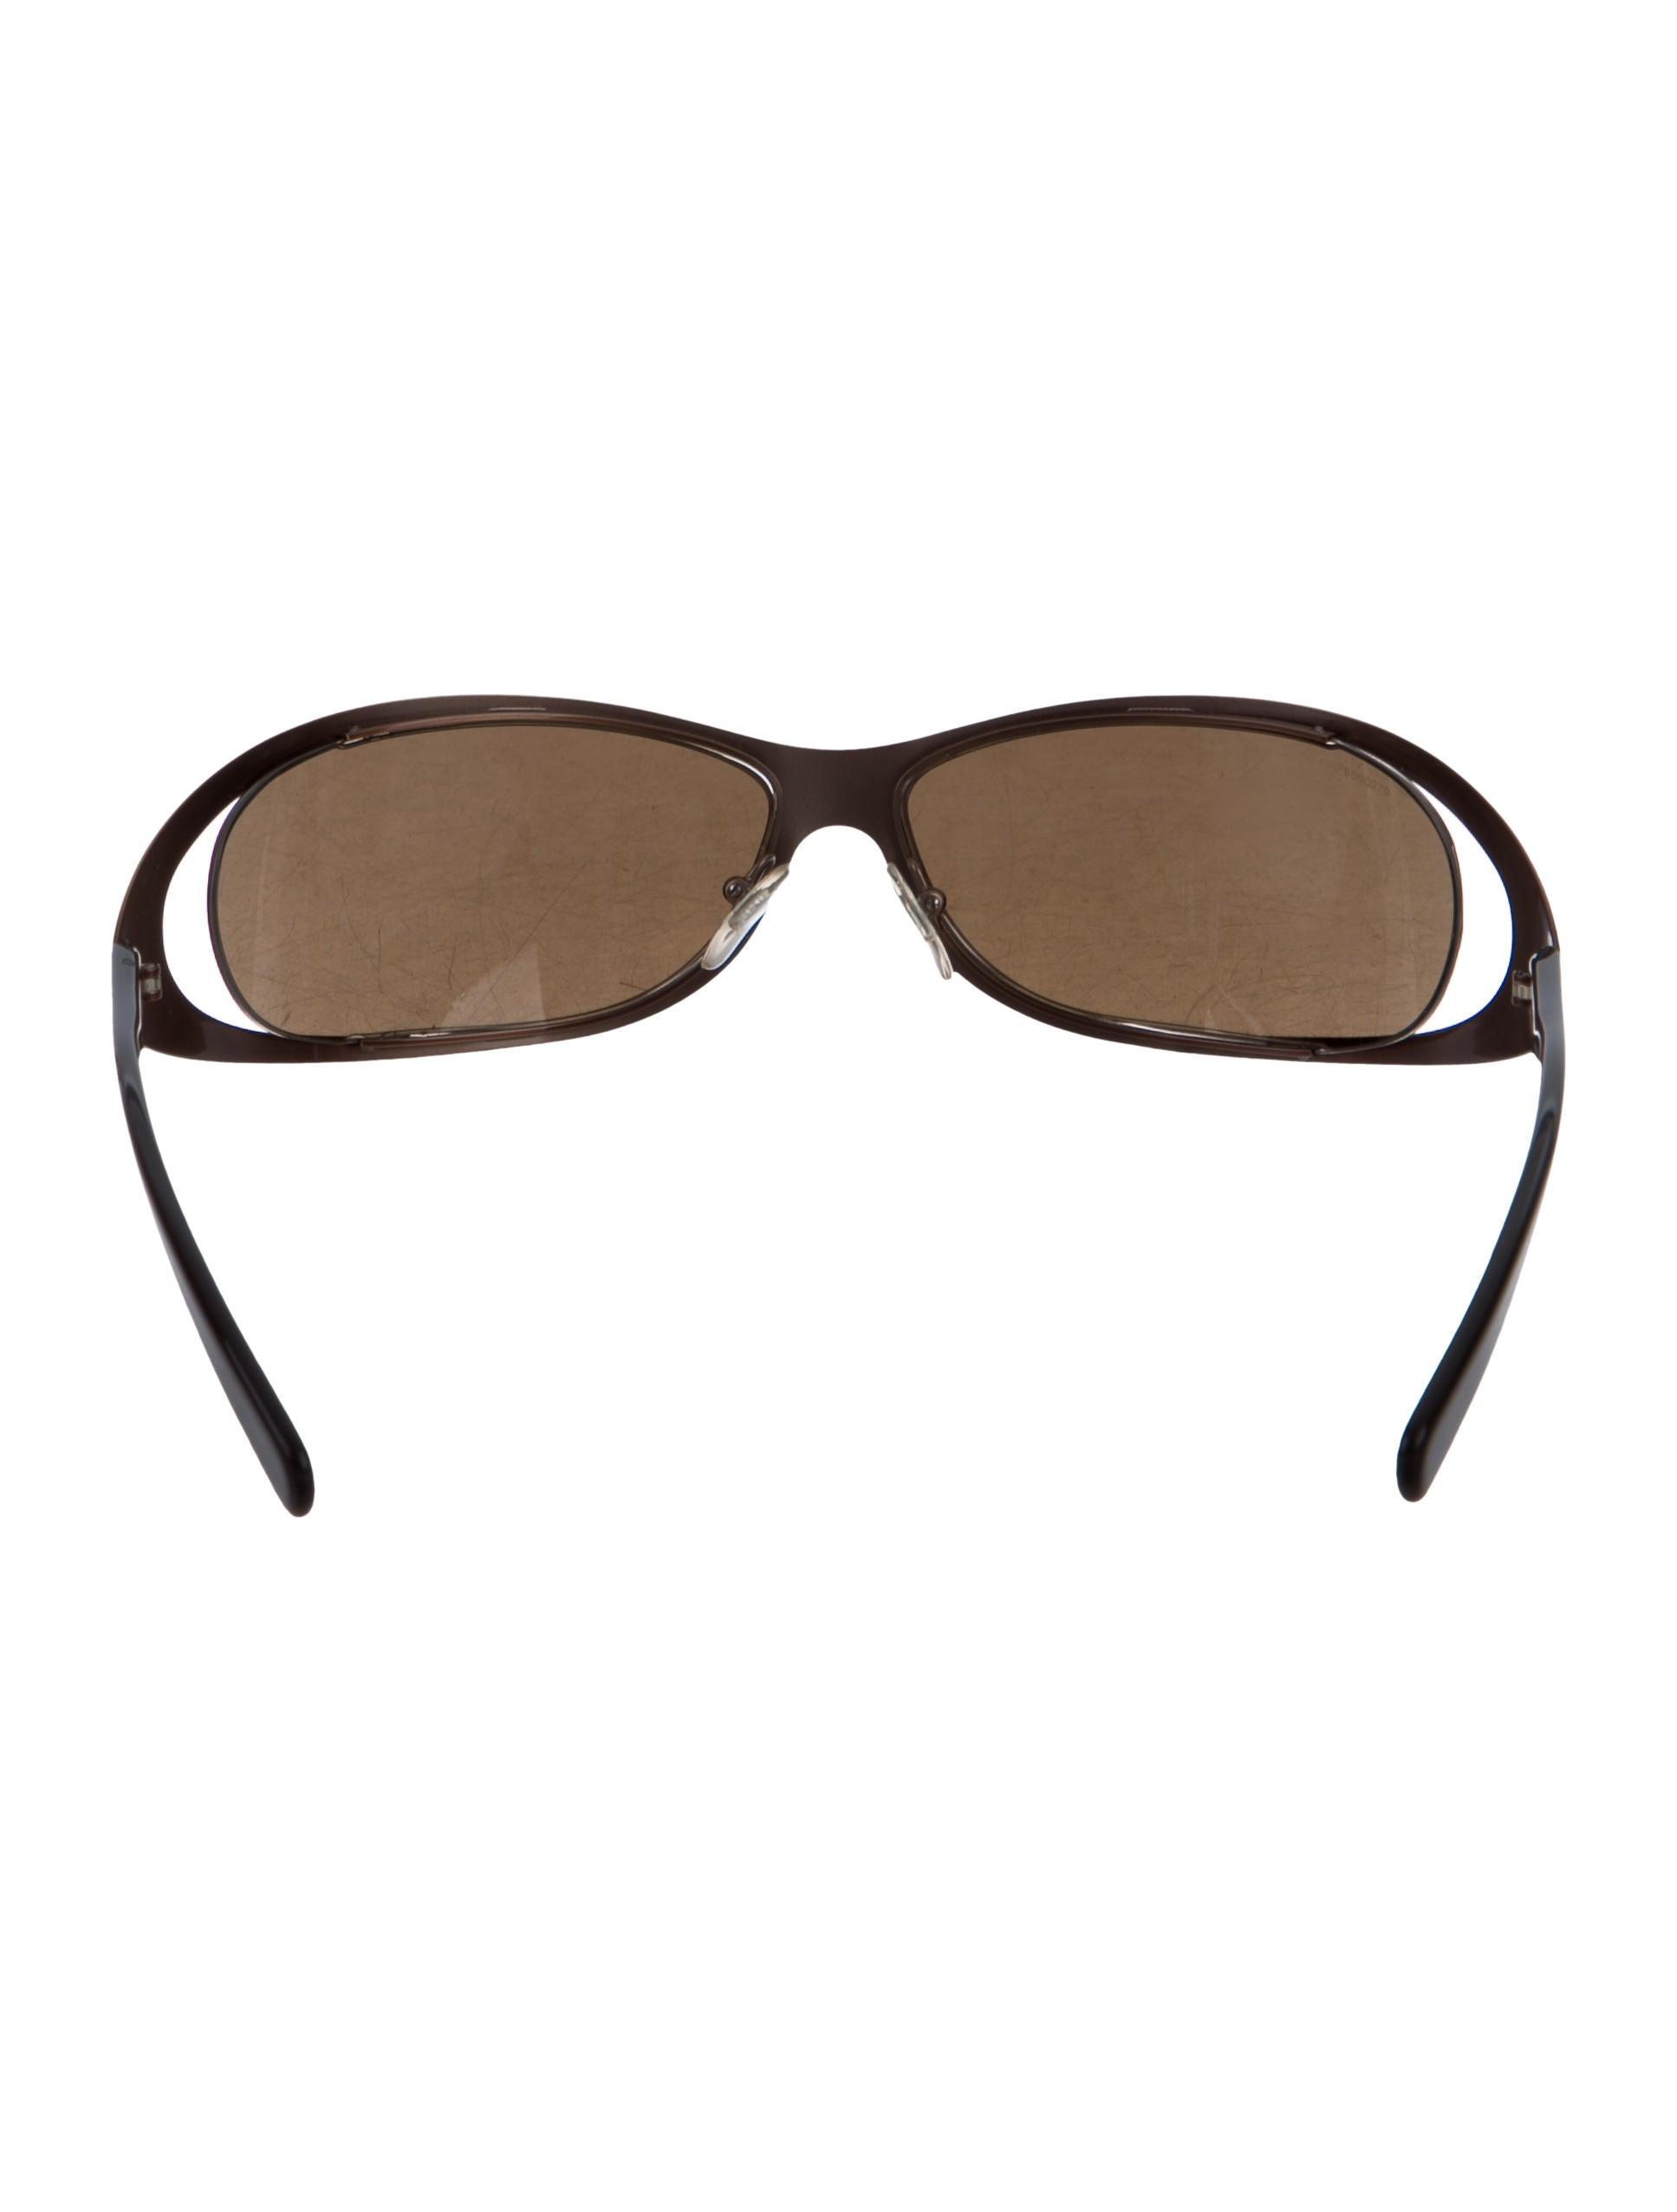 Prada Tinted Swing Sunglasses - Accessories